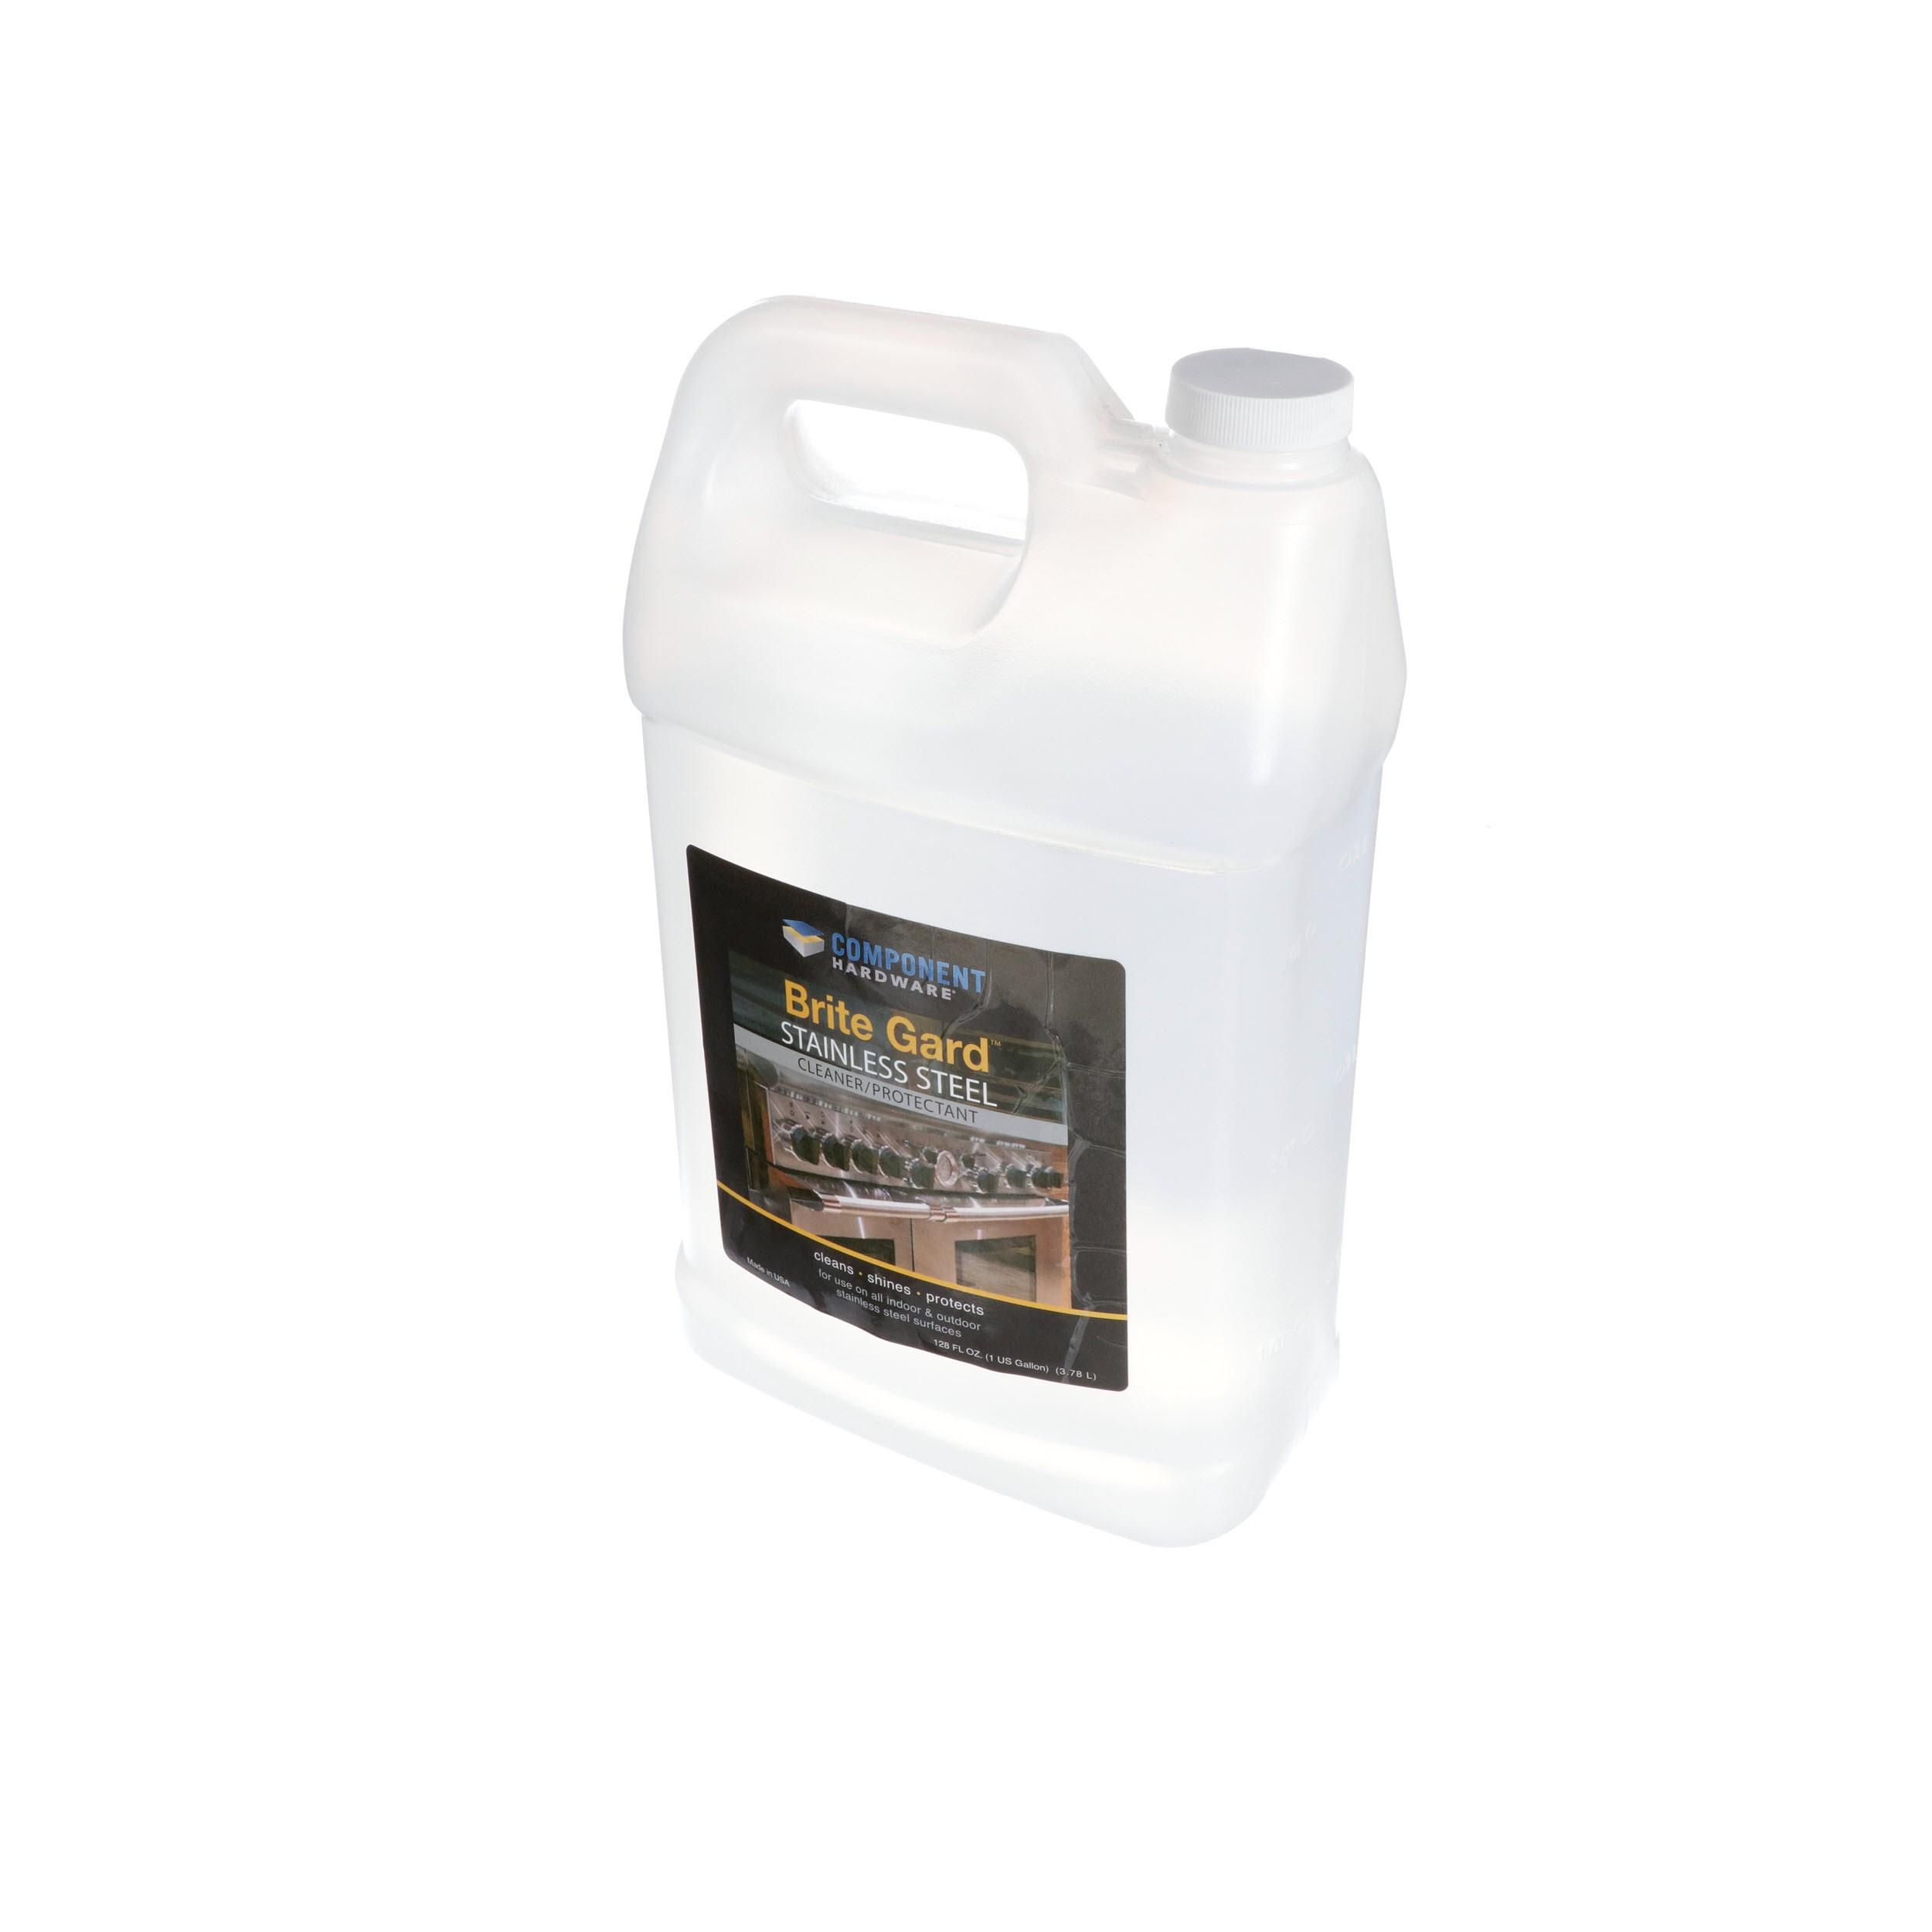 1 gallon brite gard stainless steel cleaner protectant refill bottle each